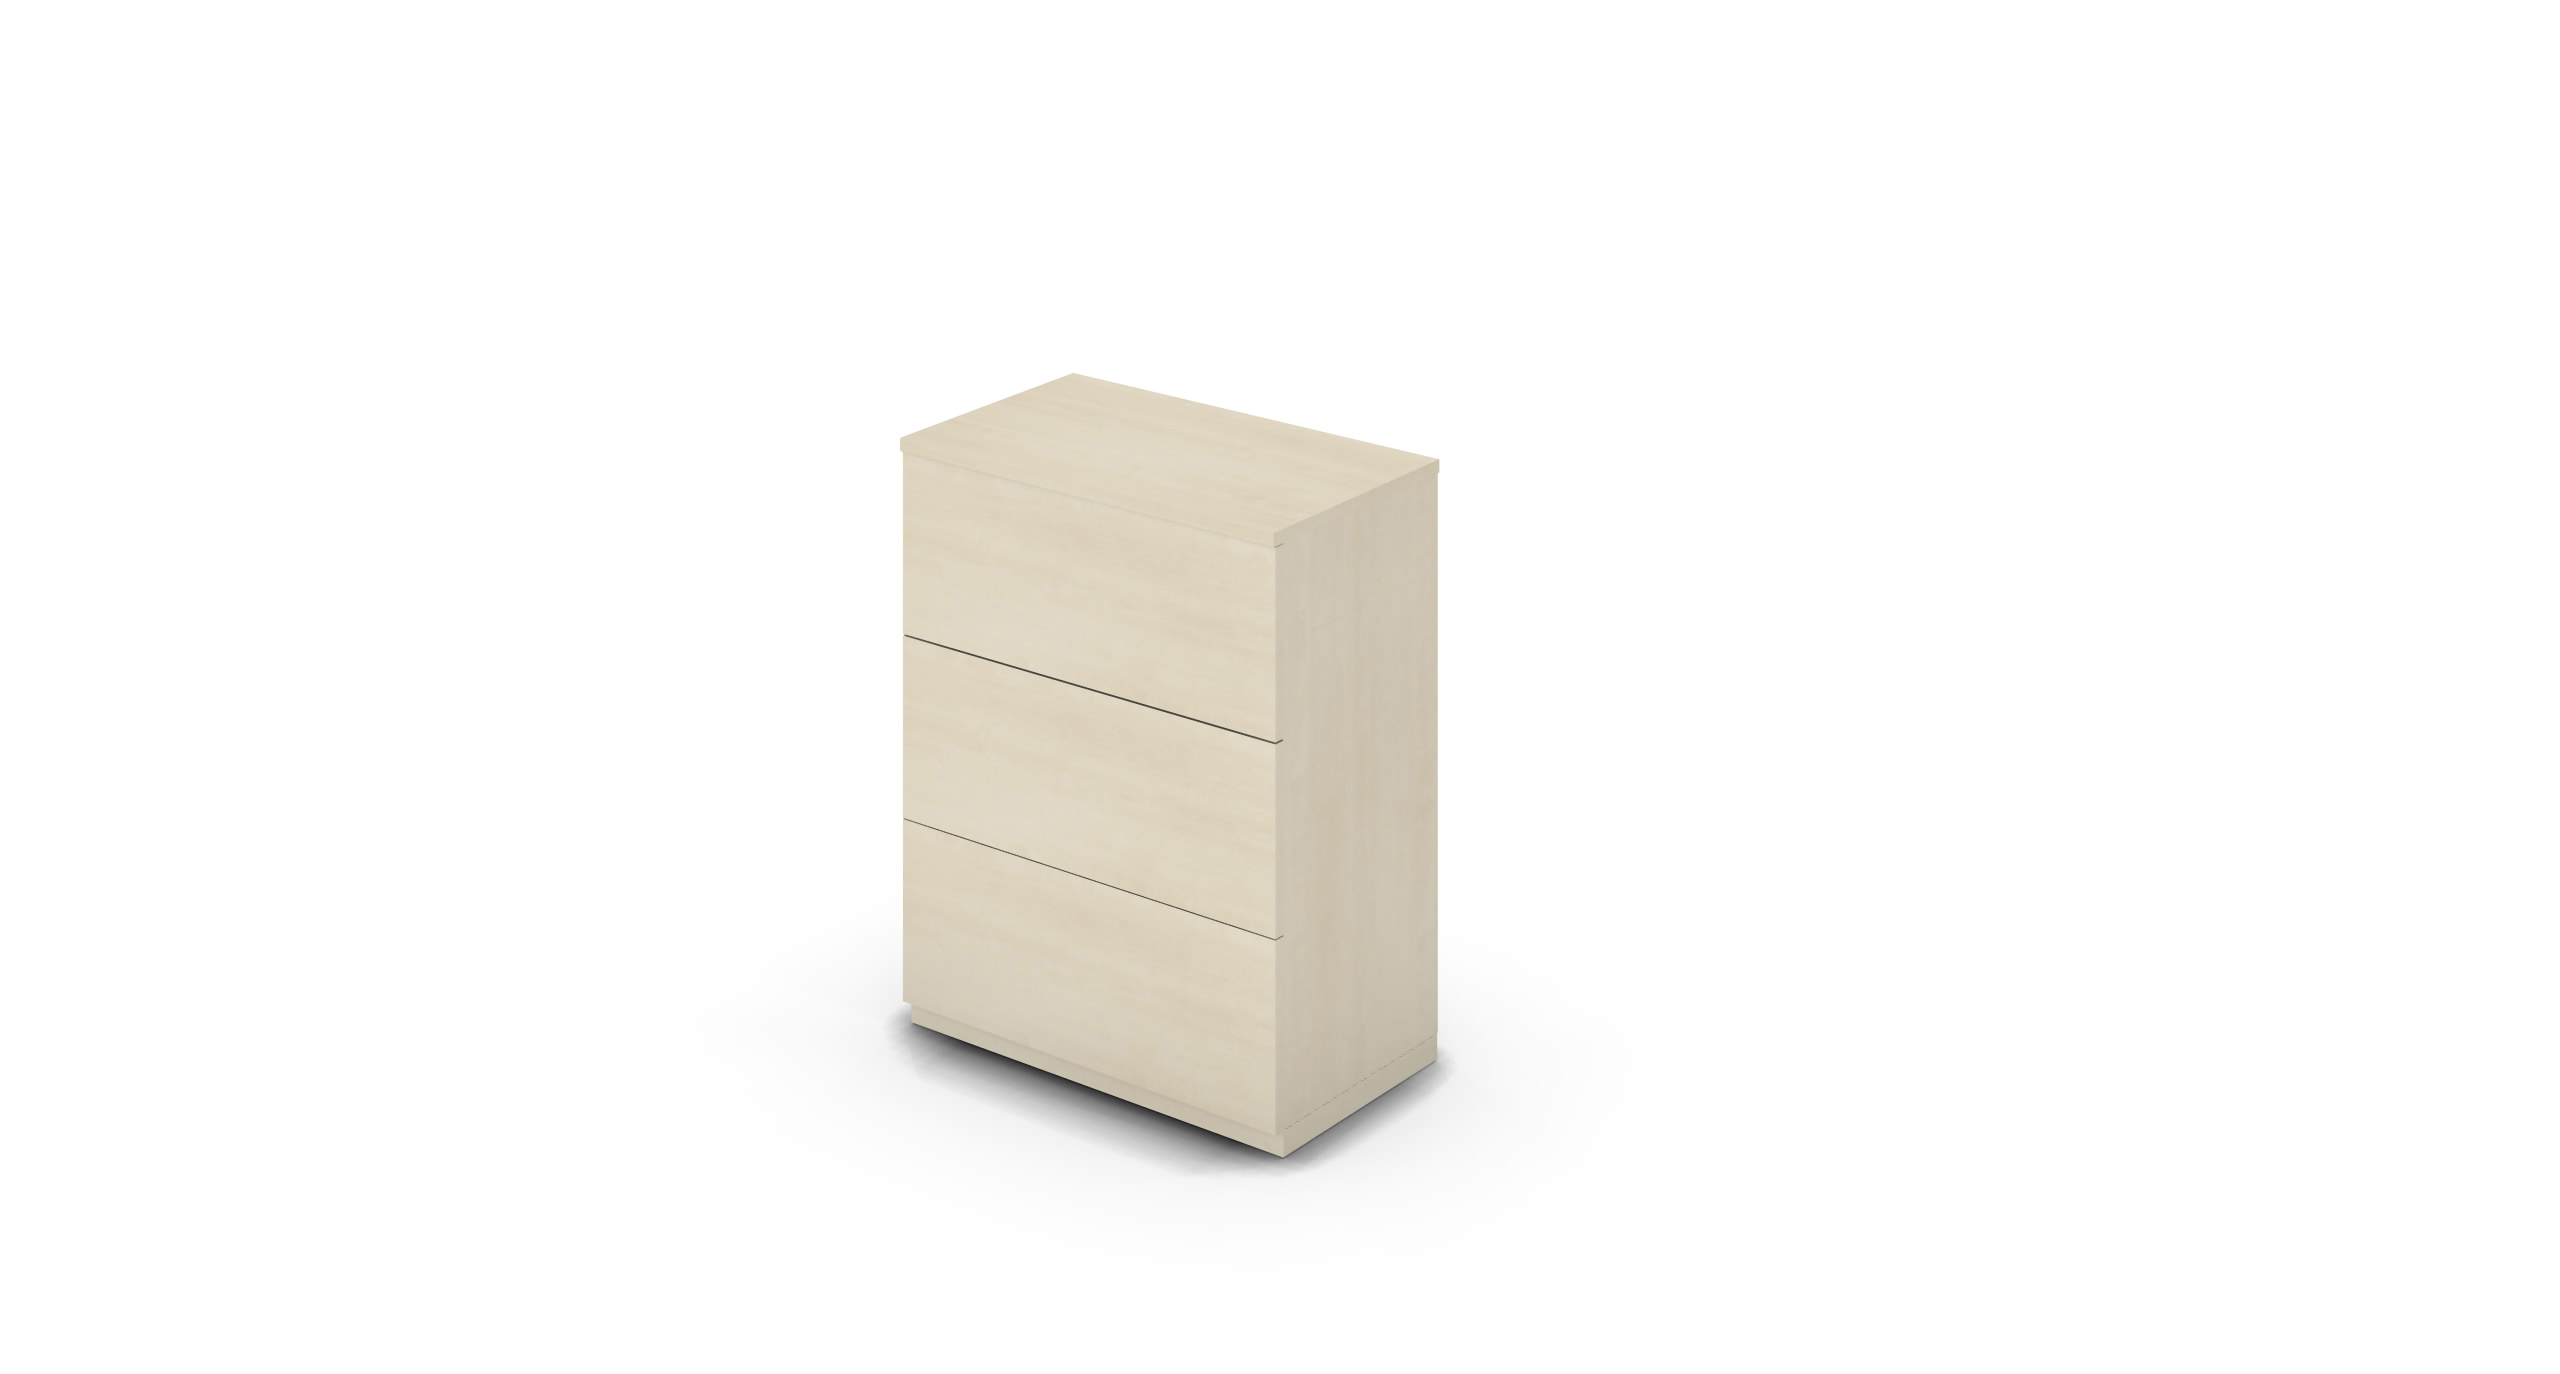 Cabinet_800x450x1125_DR_Maple_Push_NoCylinder